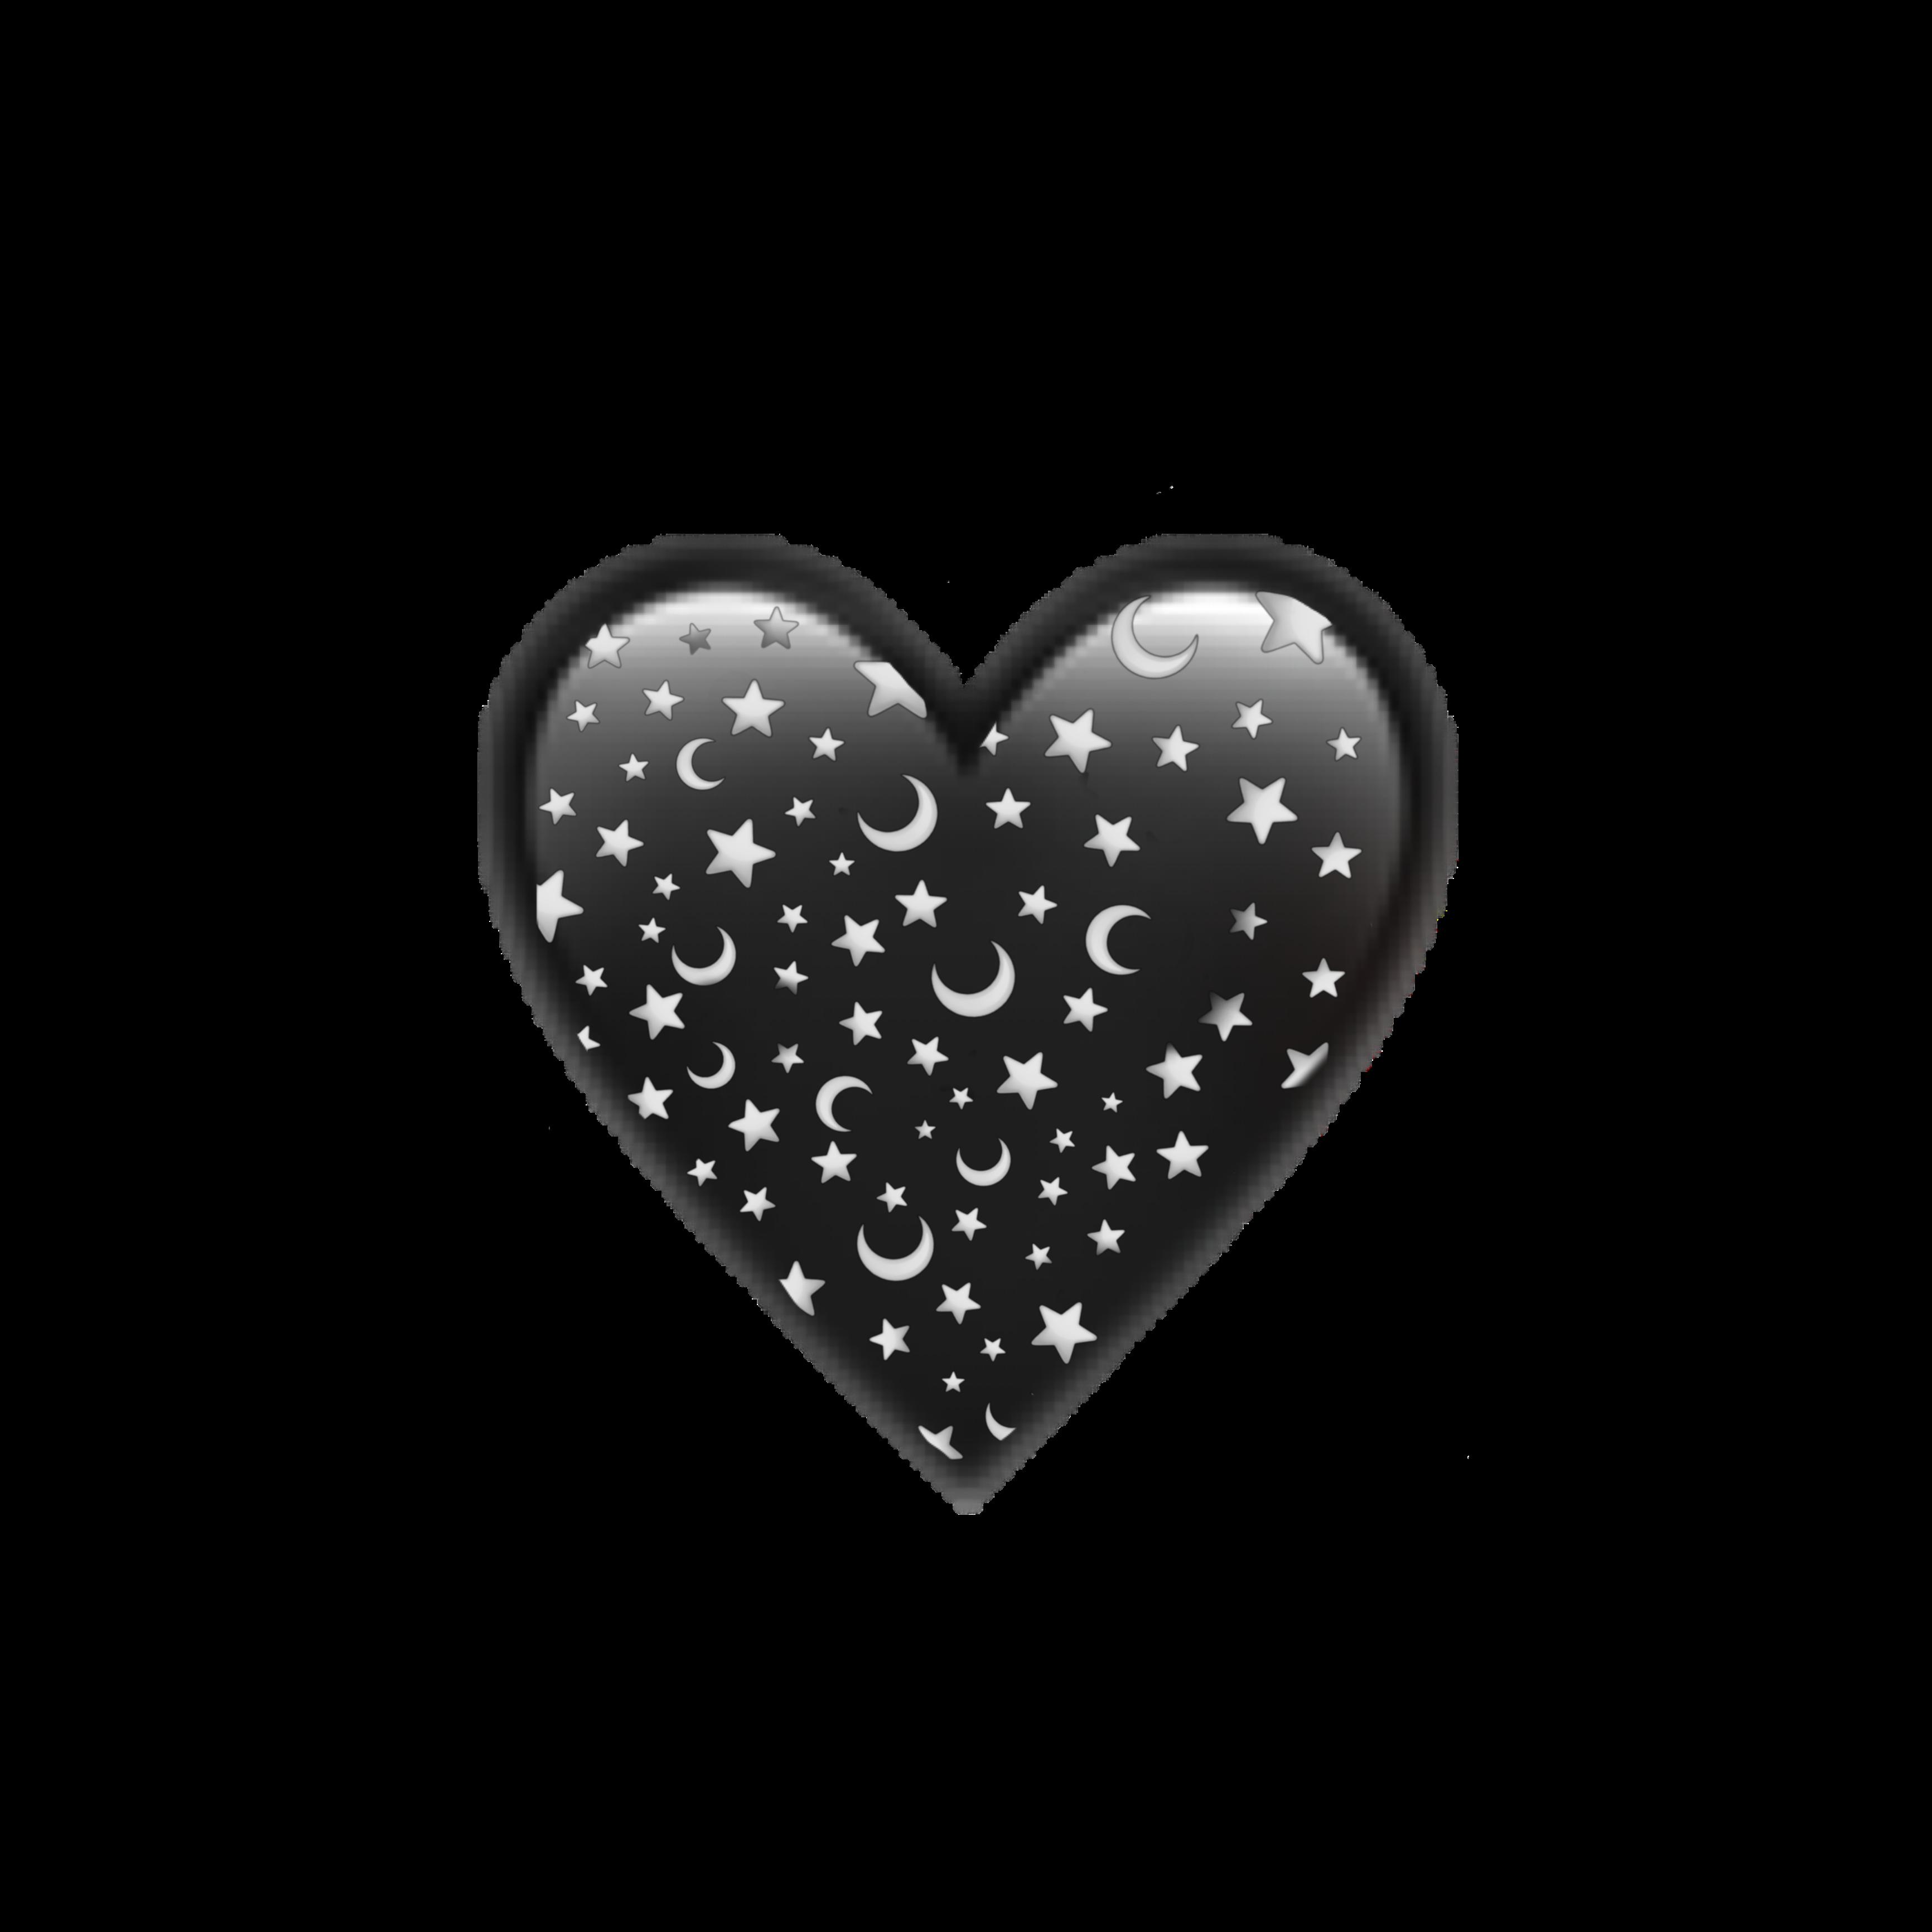 Moon Luna Heart Corazon Negro Black Estrellas Stars Emo